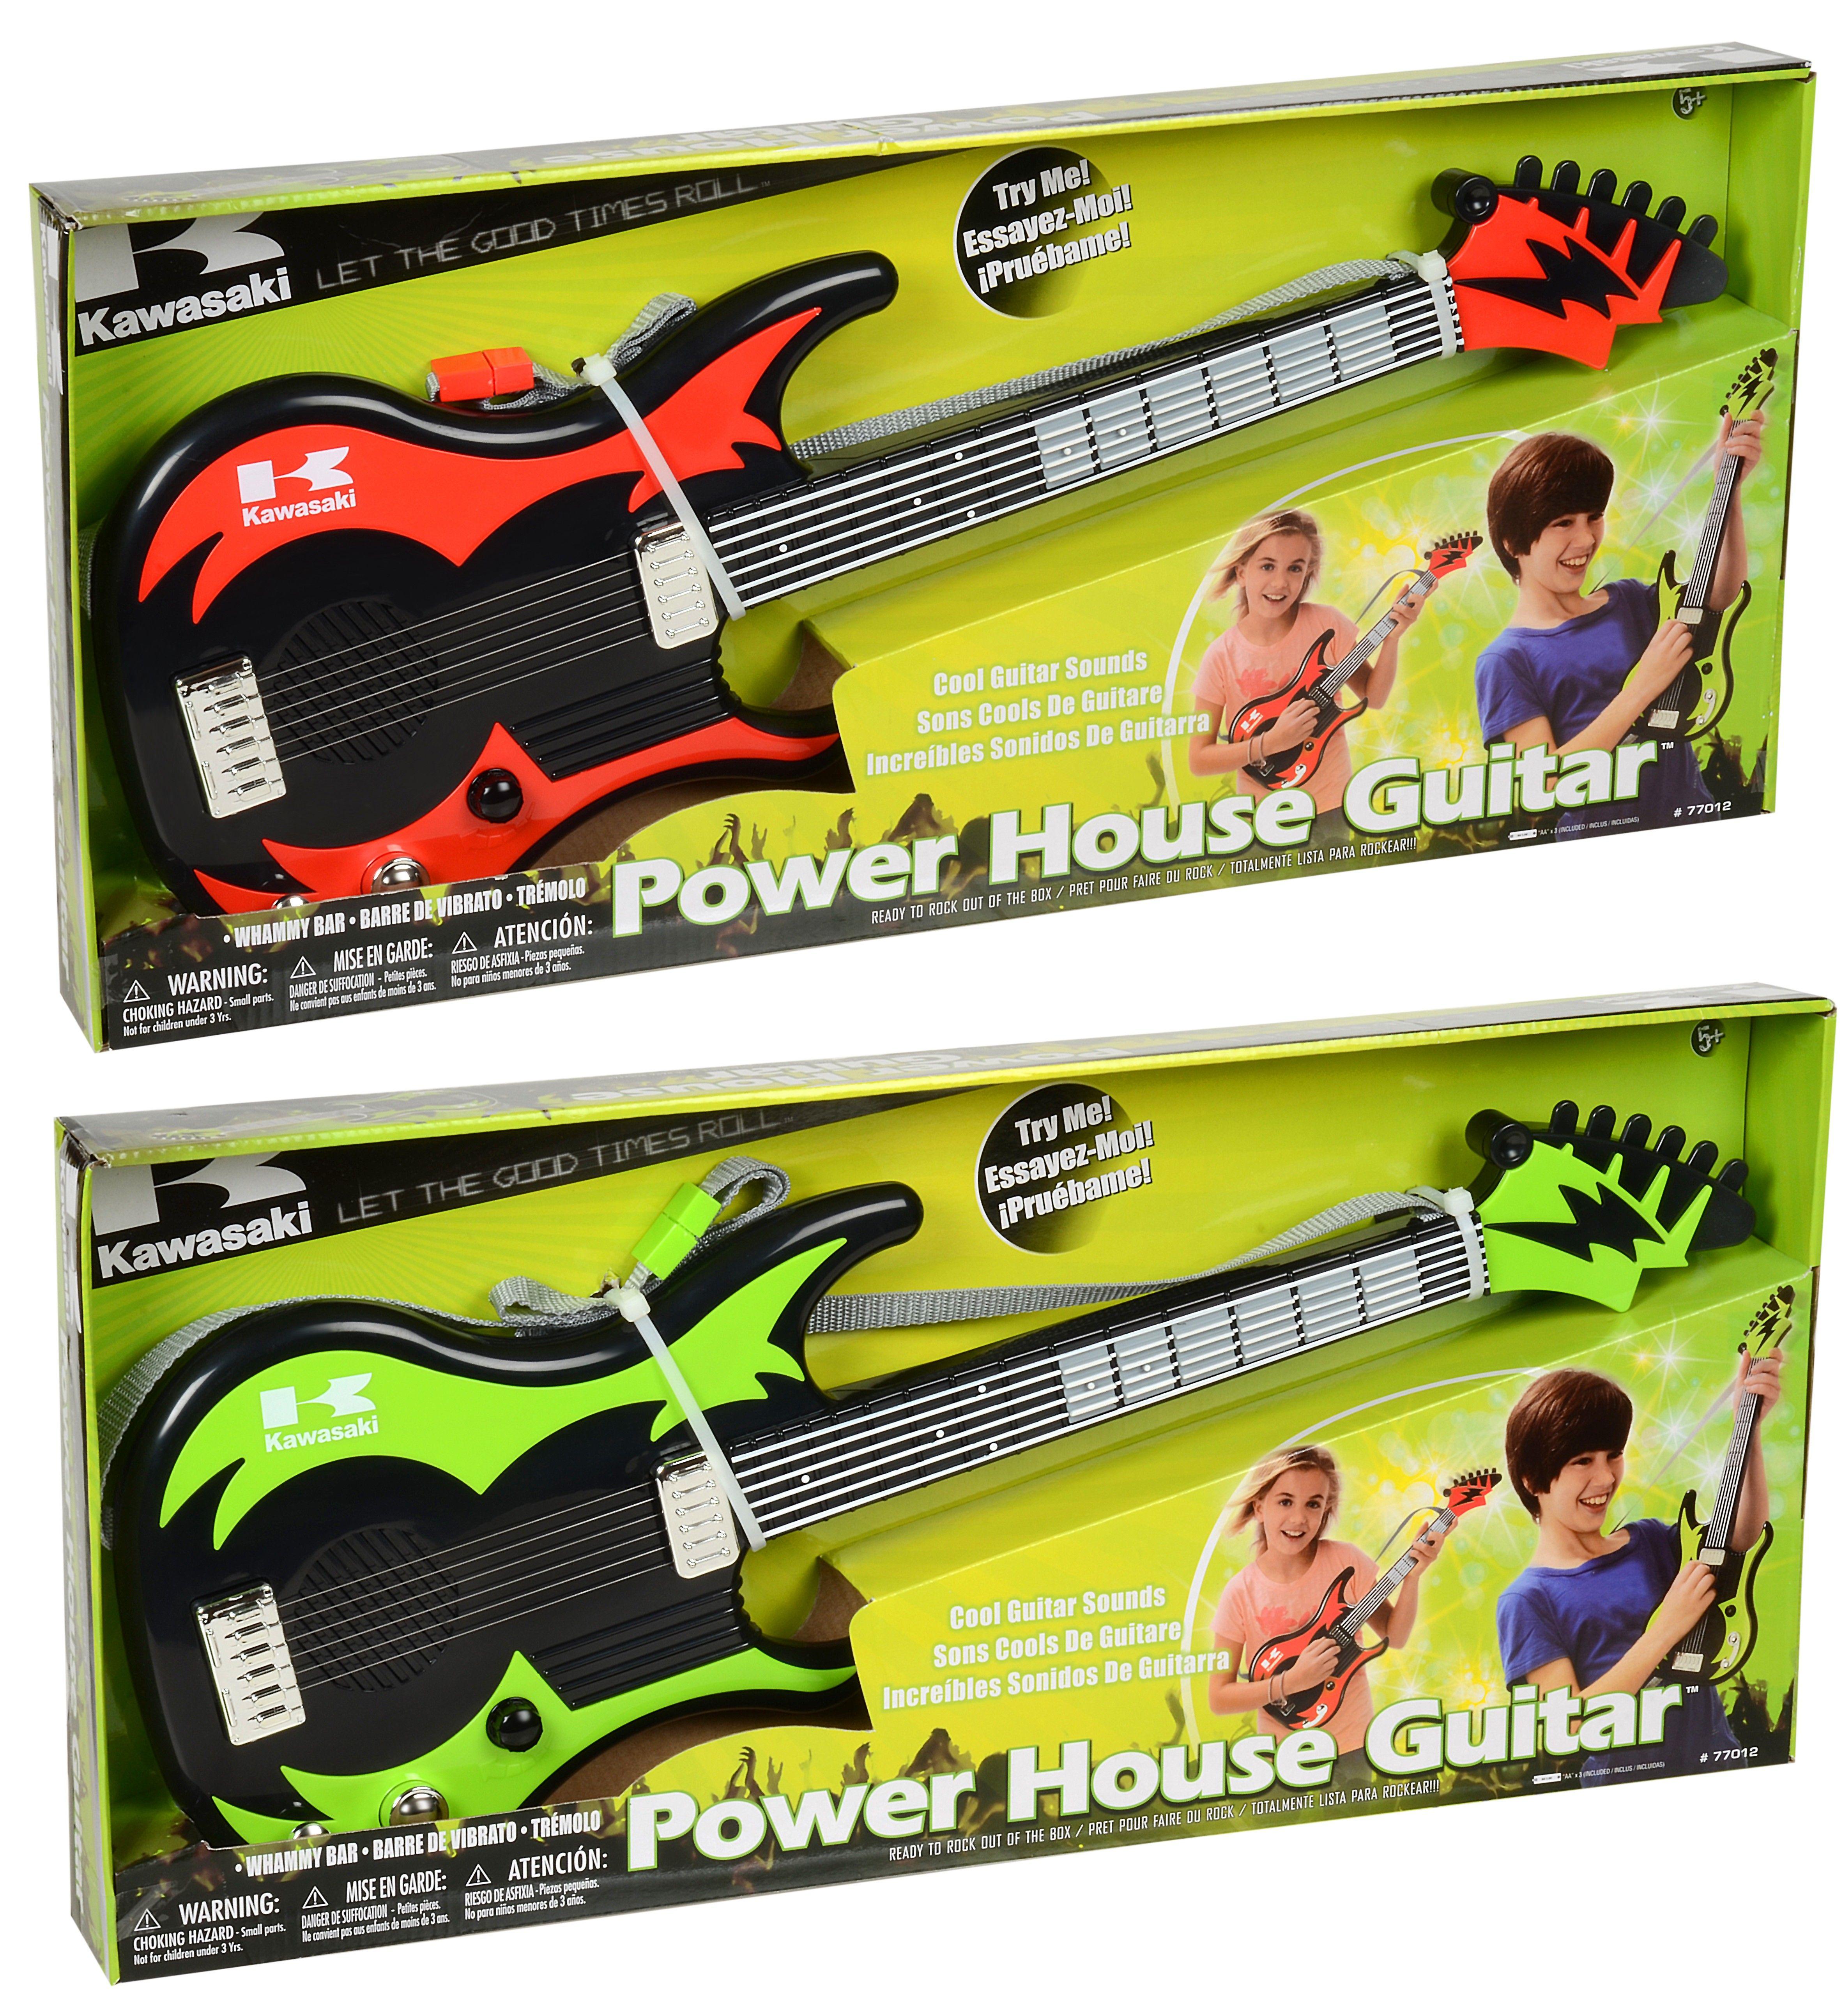 Power House Guitar Kawasaki Guitars Pinterest Guitar